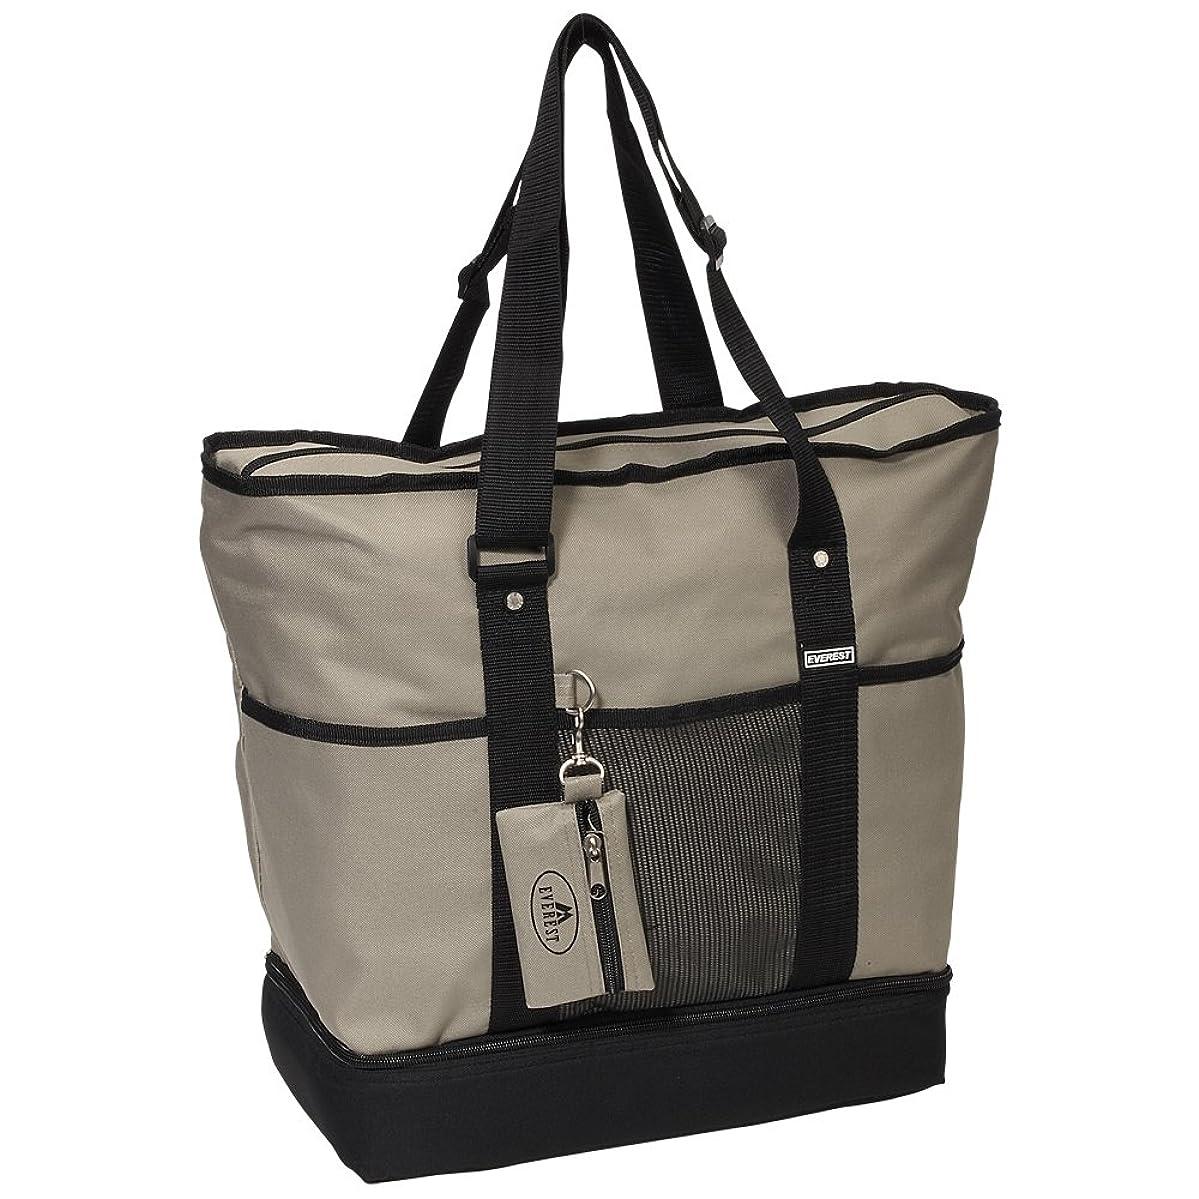 Everest Luggage Deluxe Shopping Tote, Khaki/Black, Khaki/Black, One Size